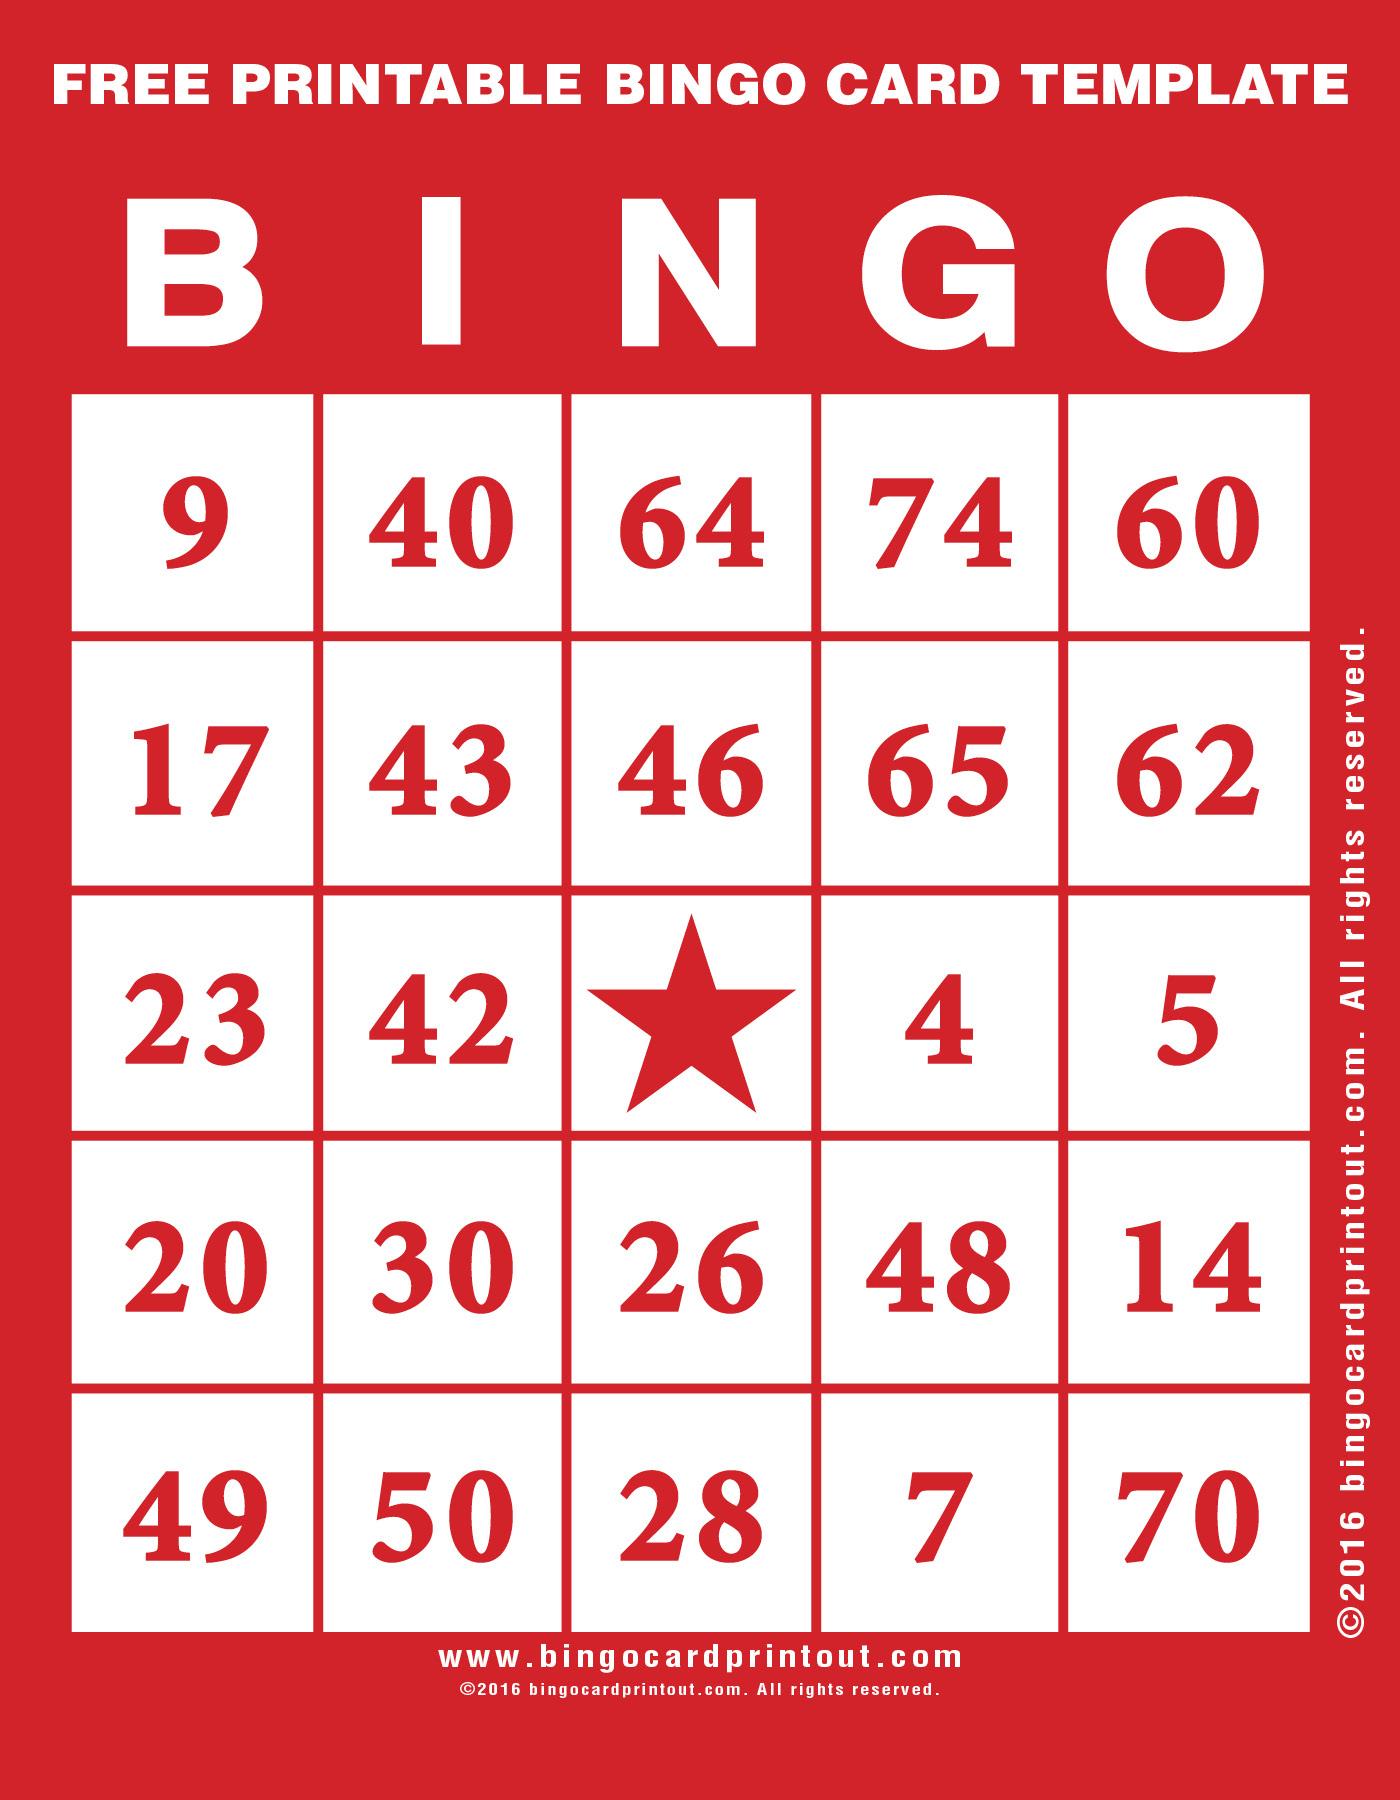 Free Printable Bingo Card Template - Bingocardprintout